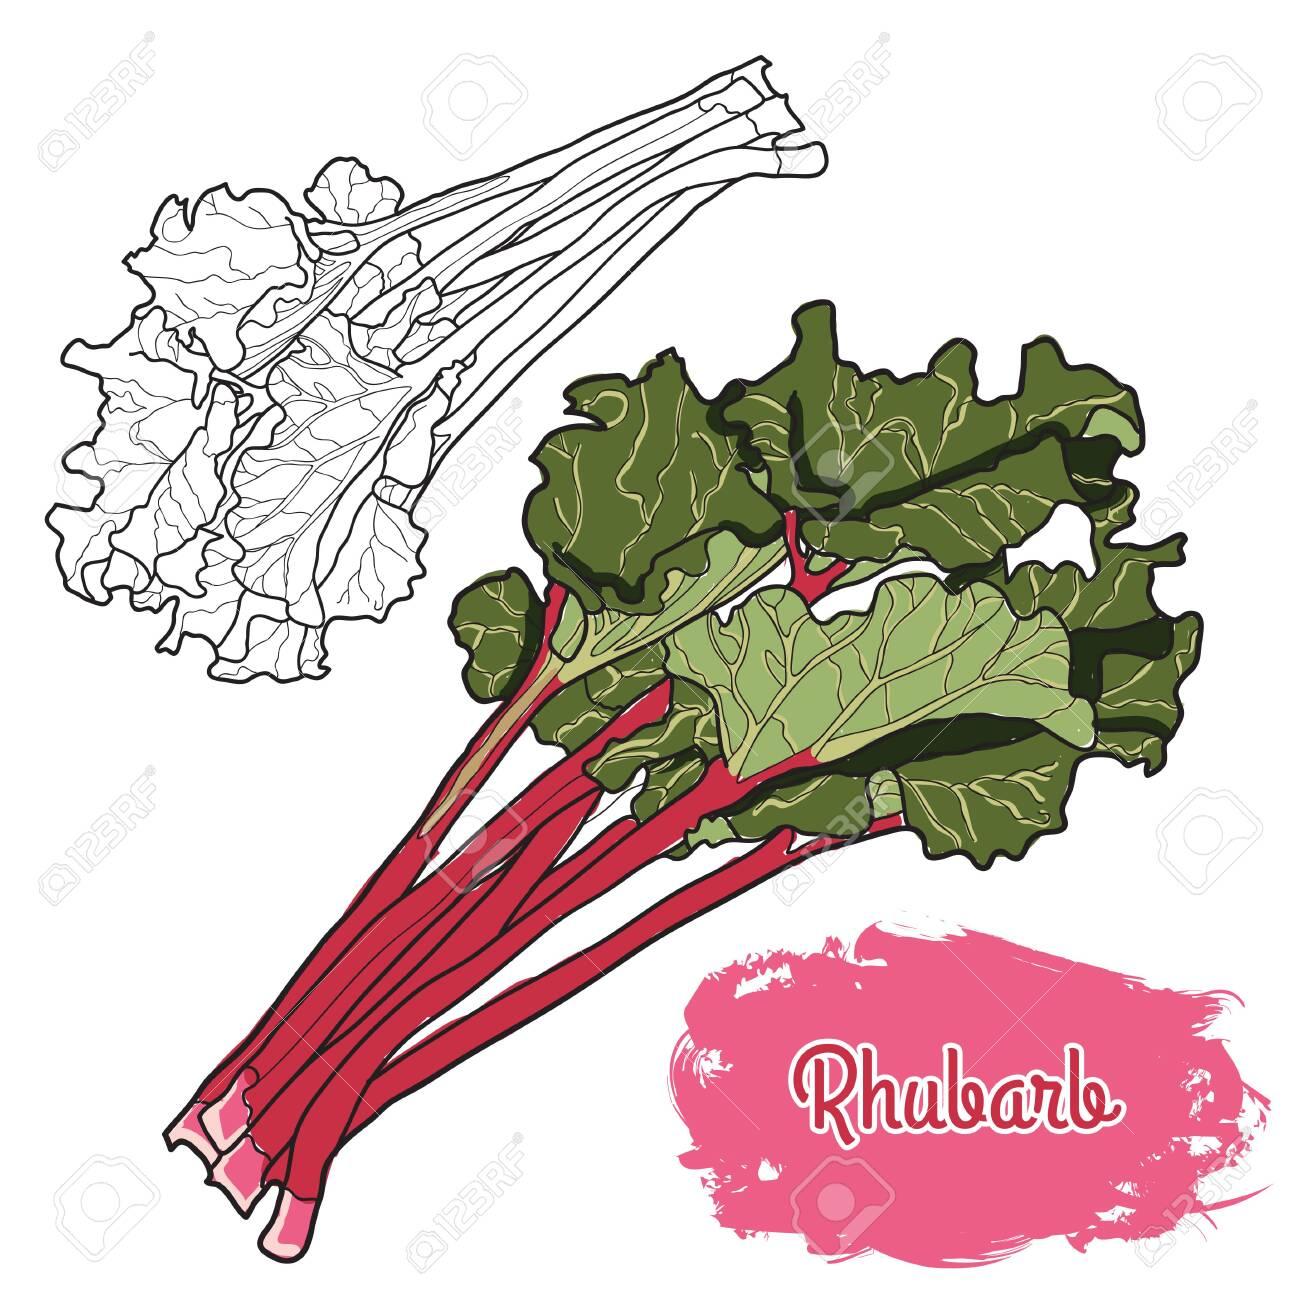 Hand drawn colorful rhubarb - 149835899